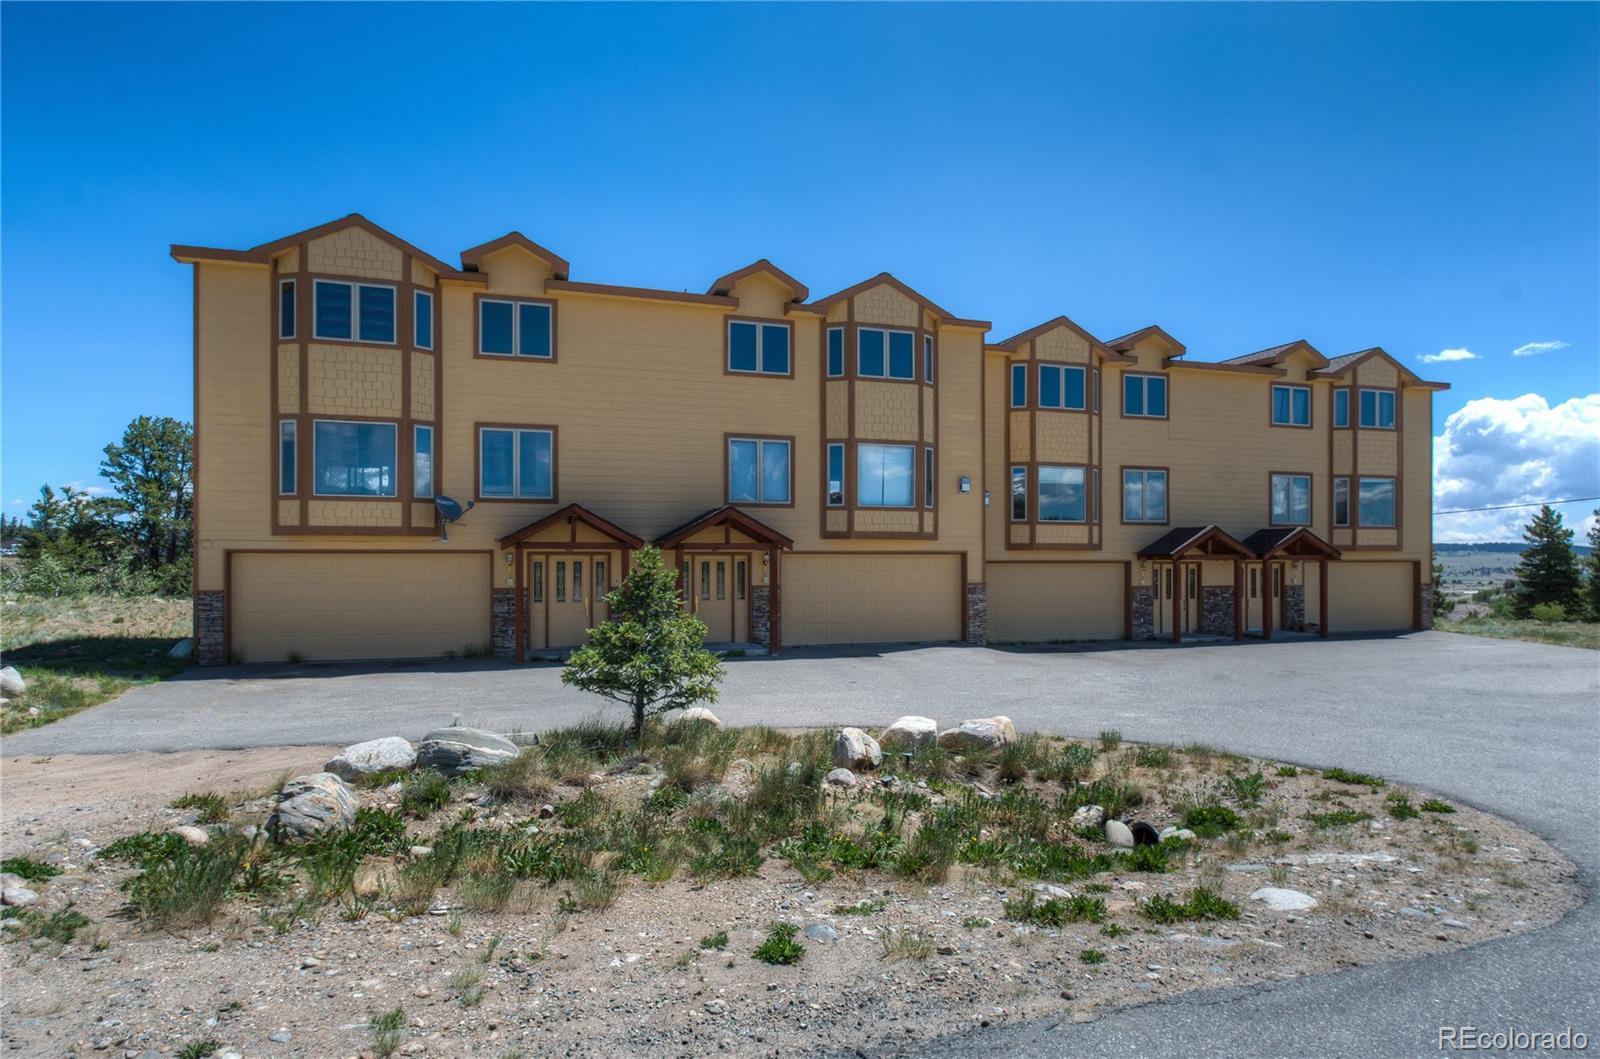 589 Platte Dr #A, B, C, D, Fairplay, CO 80440 - Fairplay, CO real estate listing